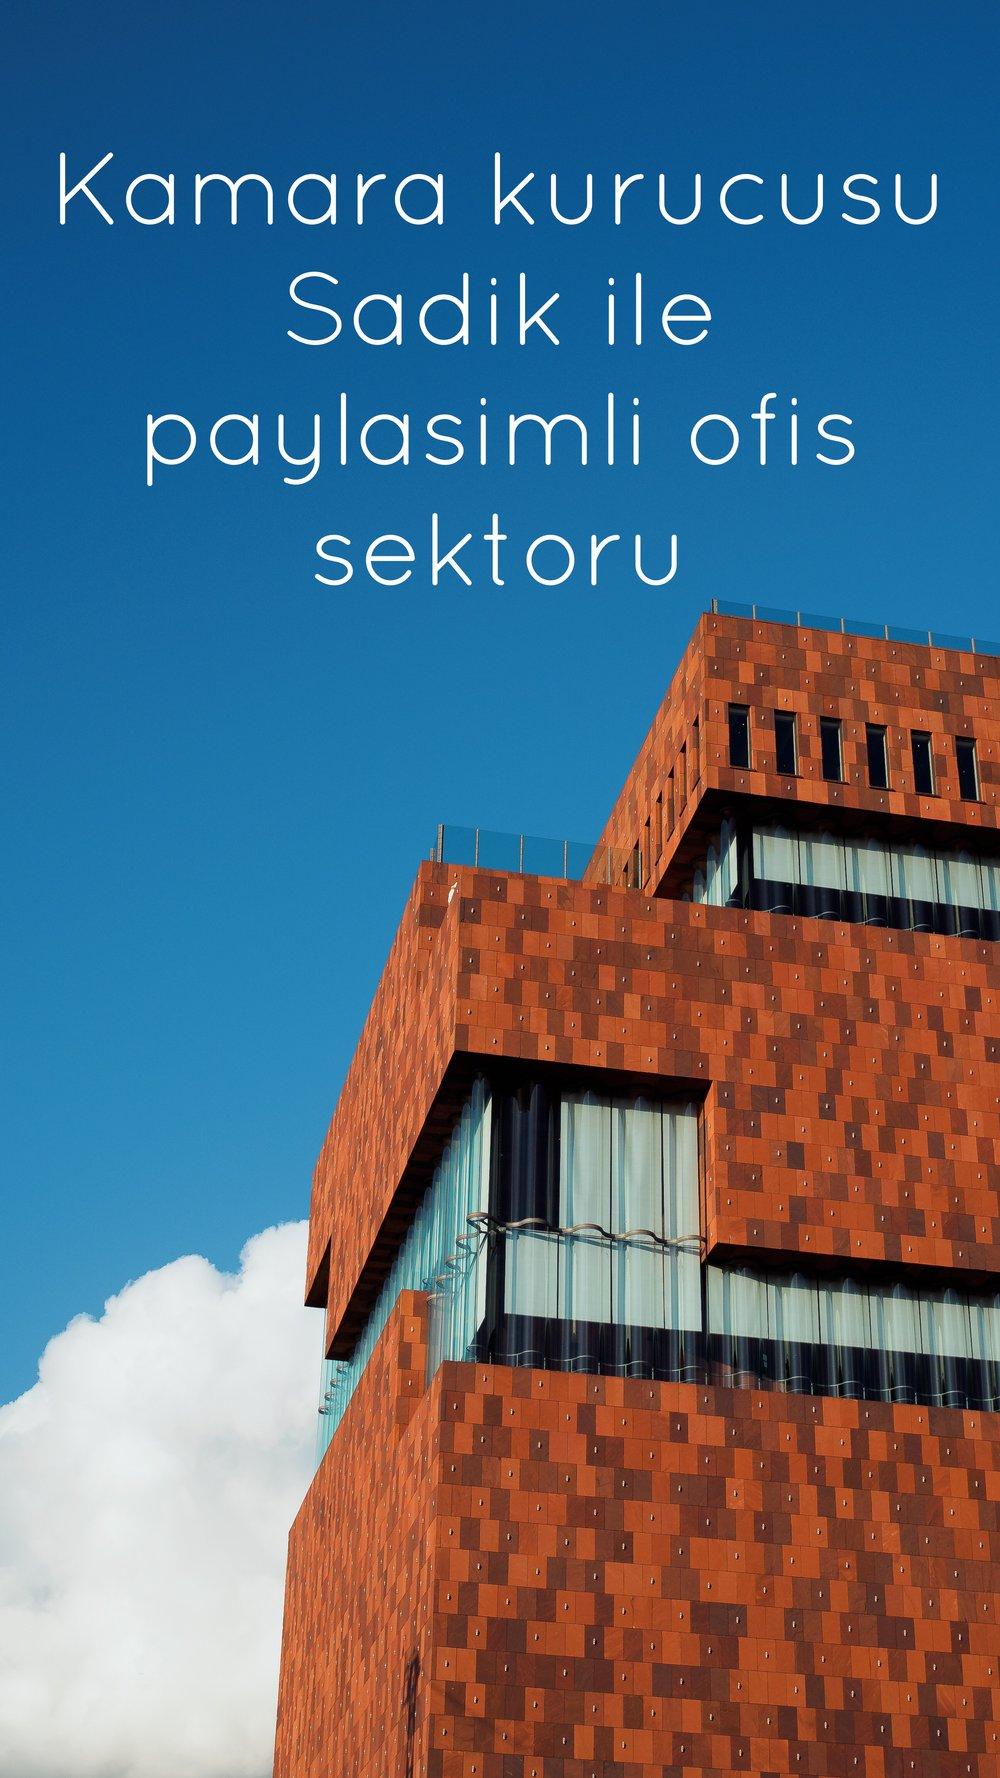 sadik-kocabasa-kamara-paylasimli-ofis